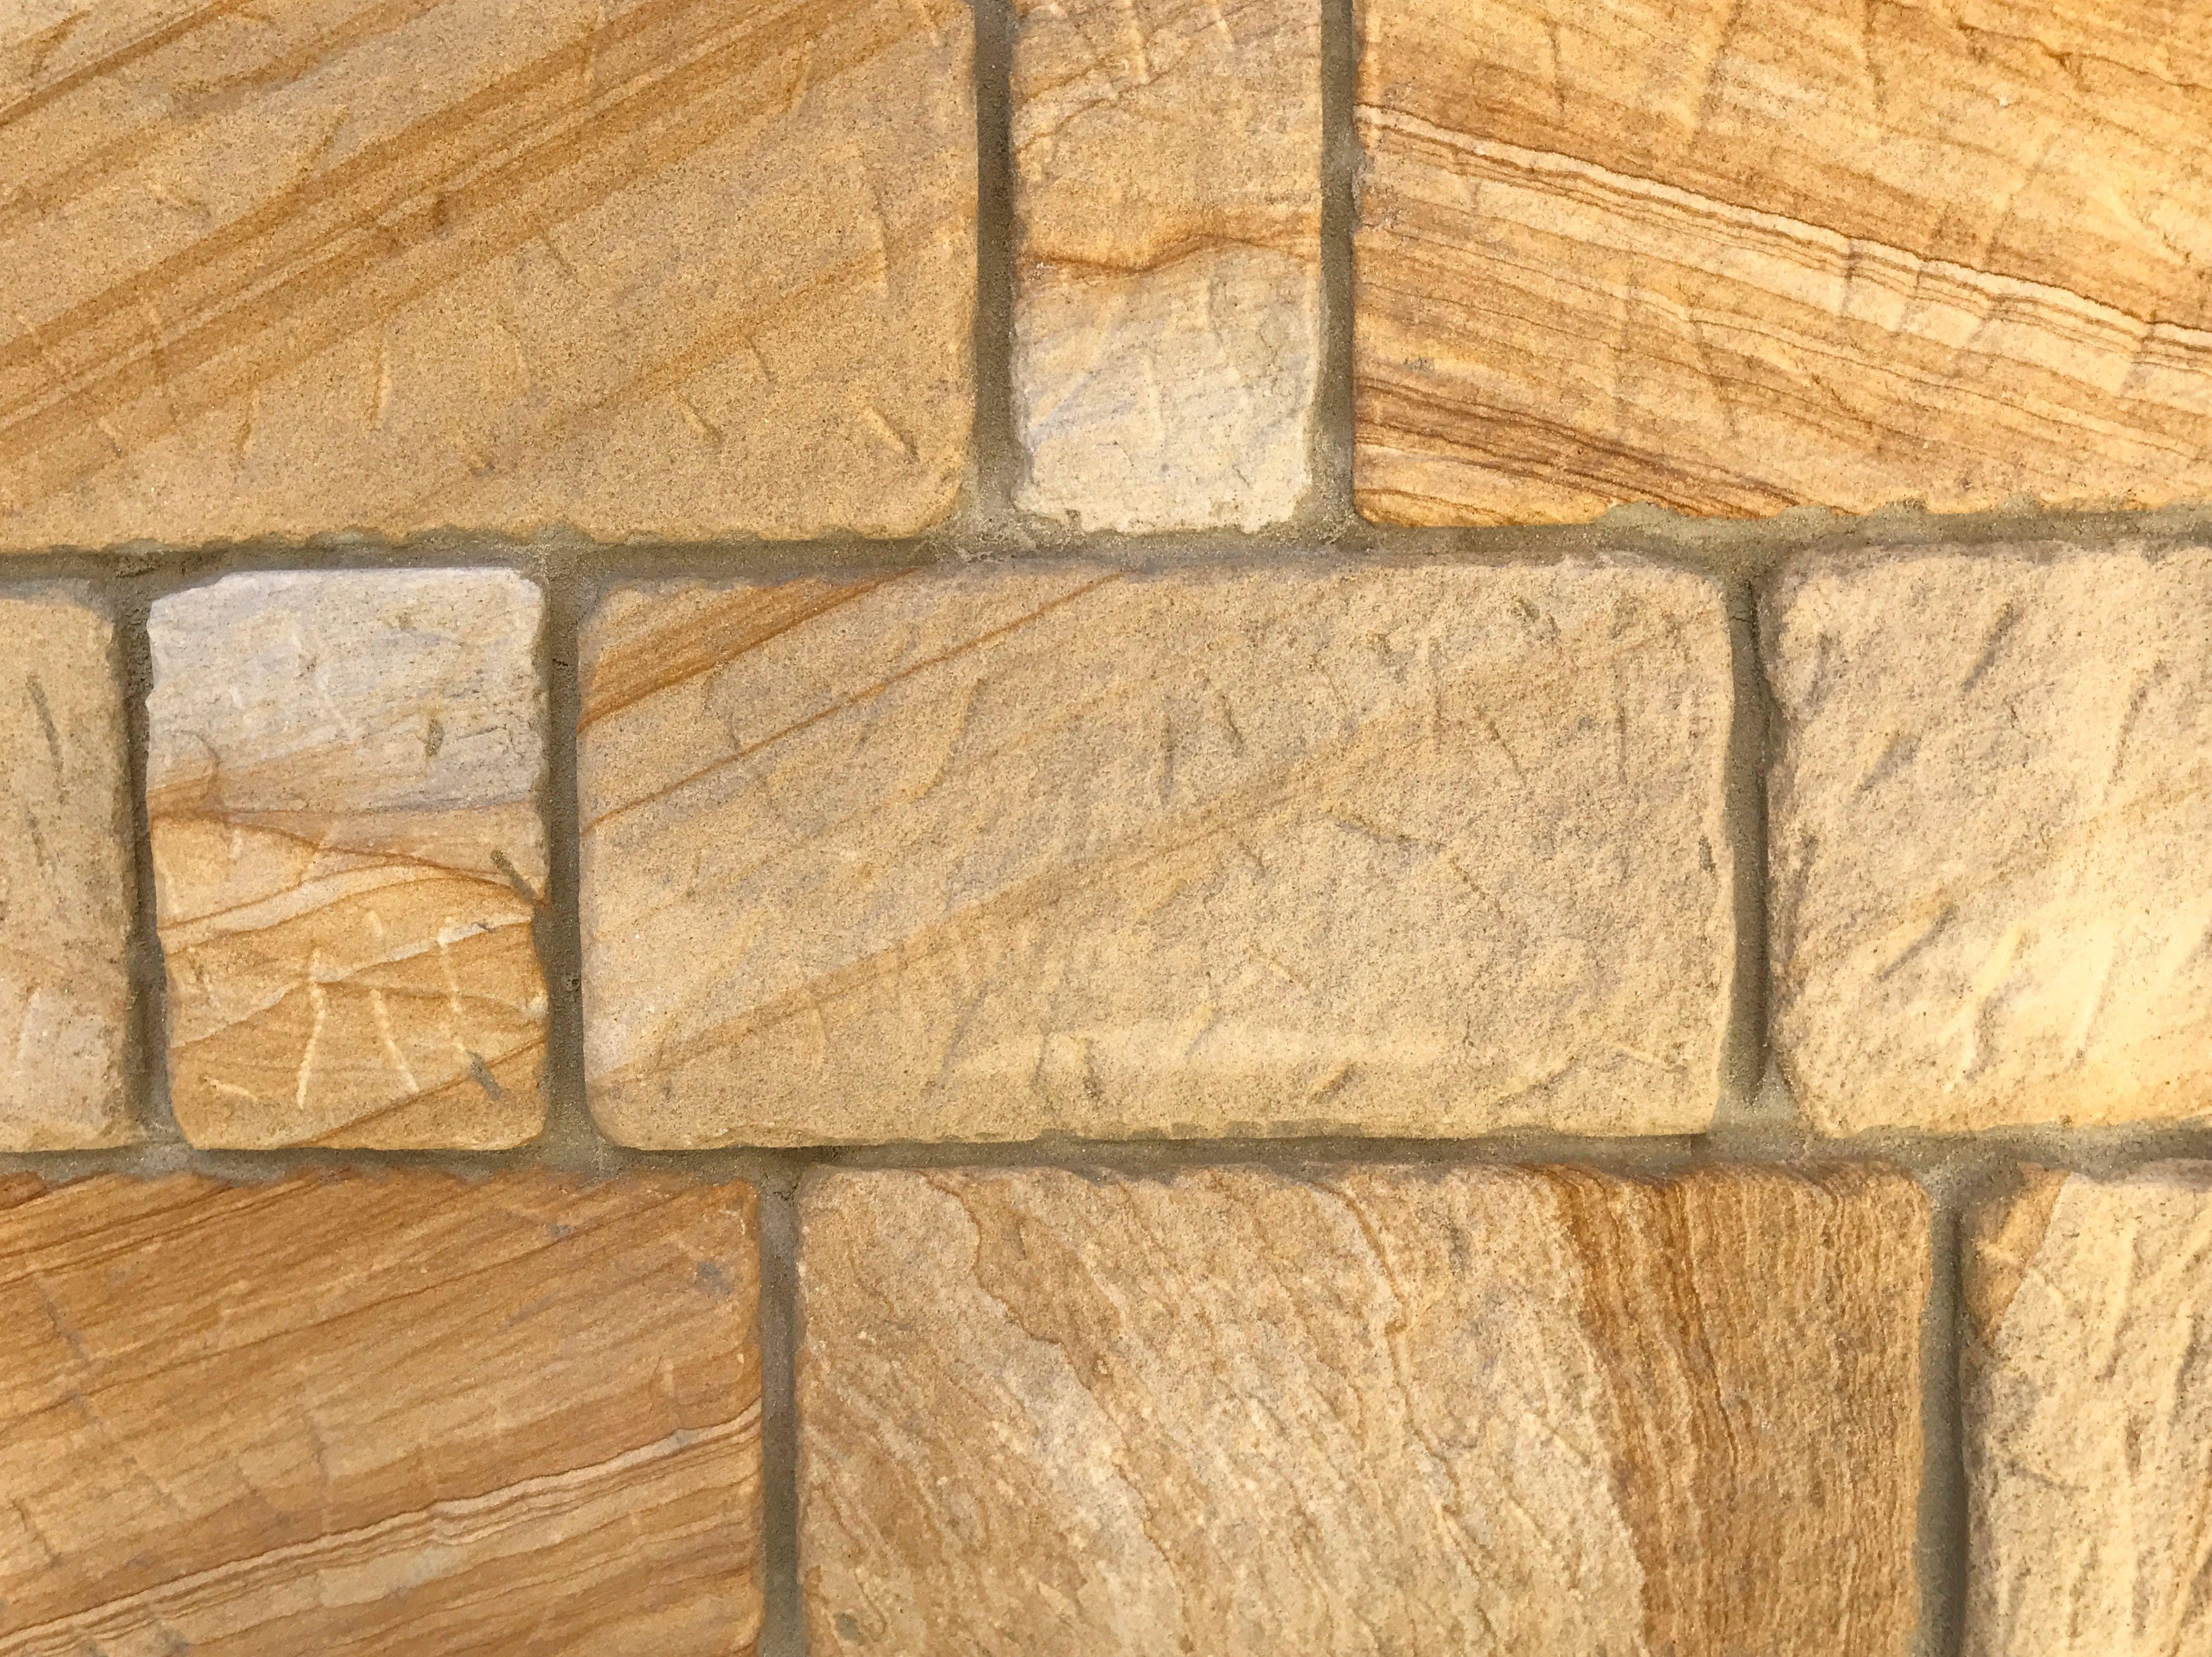 Sandstone Wall Sandstone Walls Sandstone Walling Sandstone Wall ...